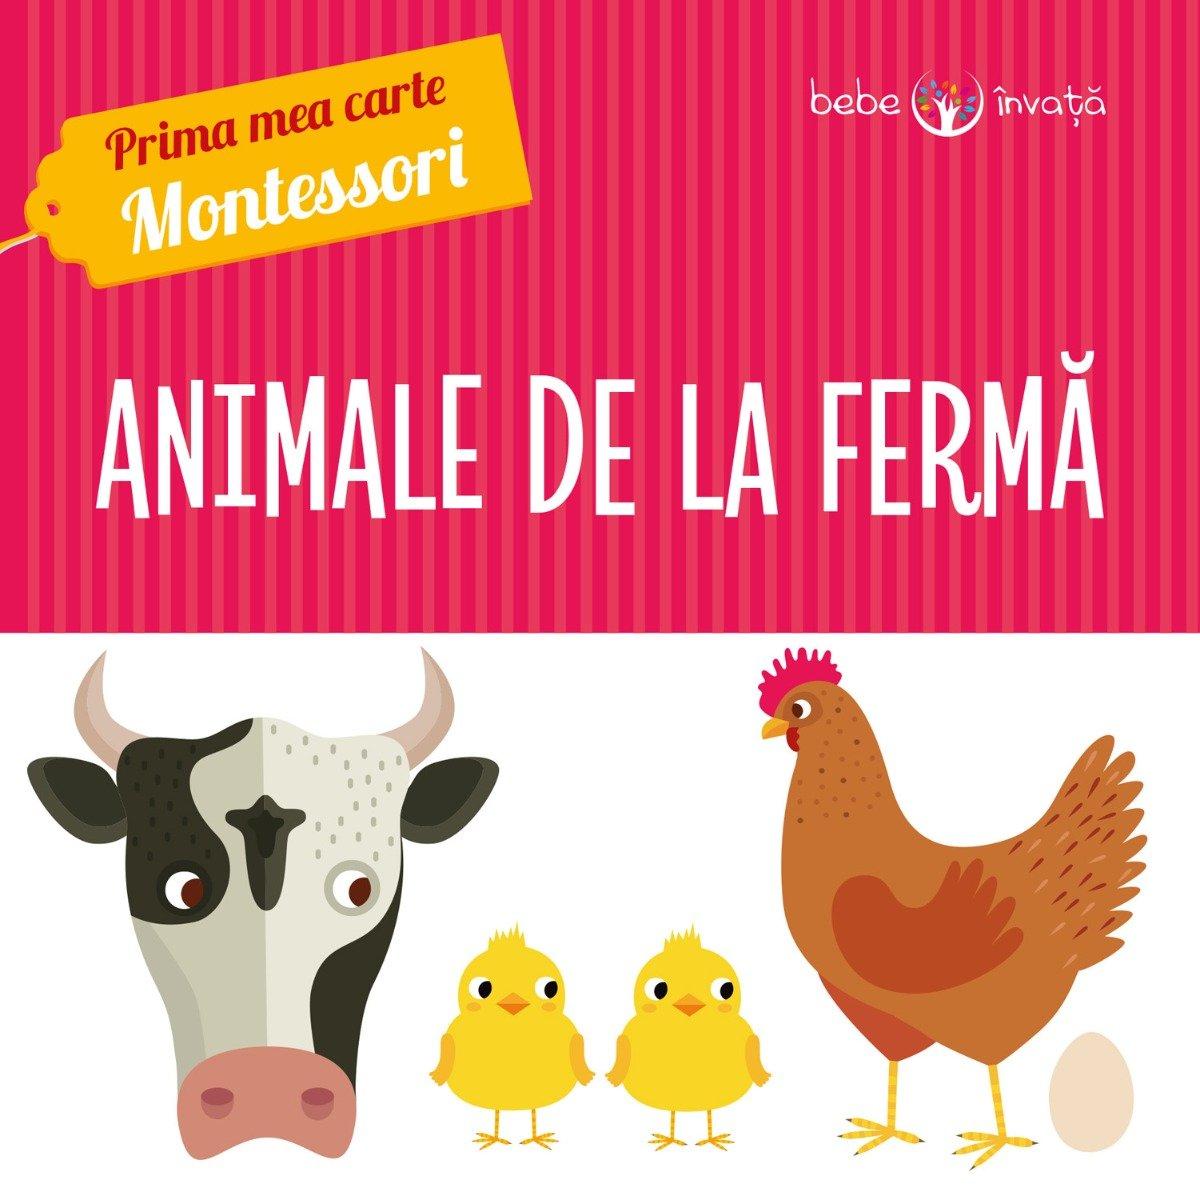 Prima mea carte Montessori - Animale de la Ferma